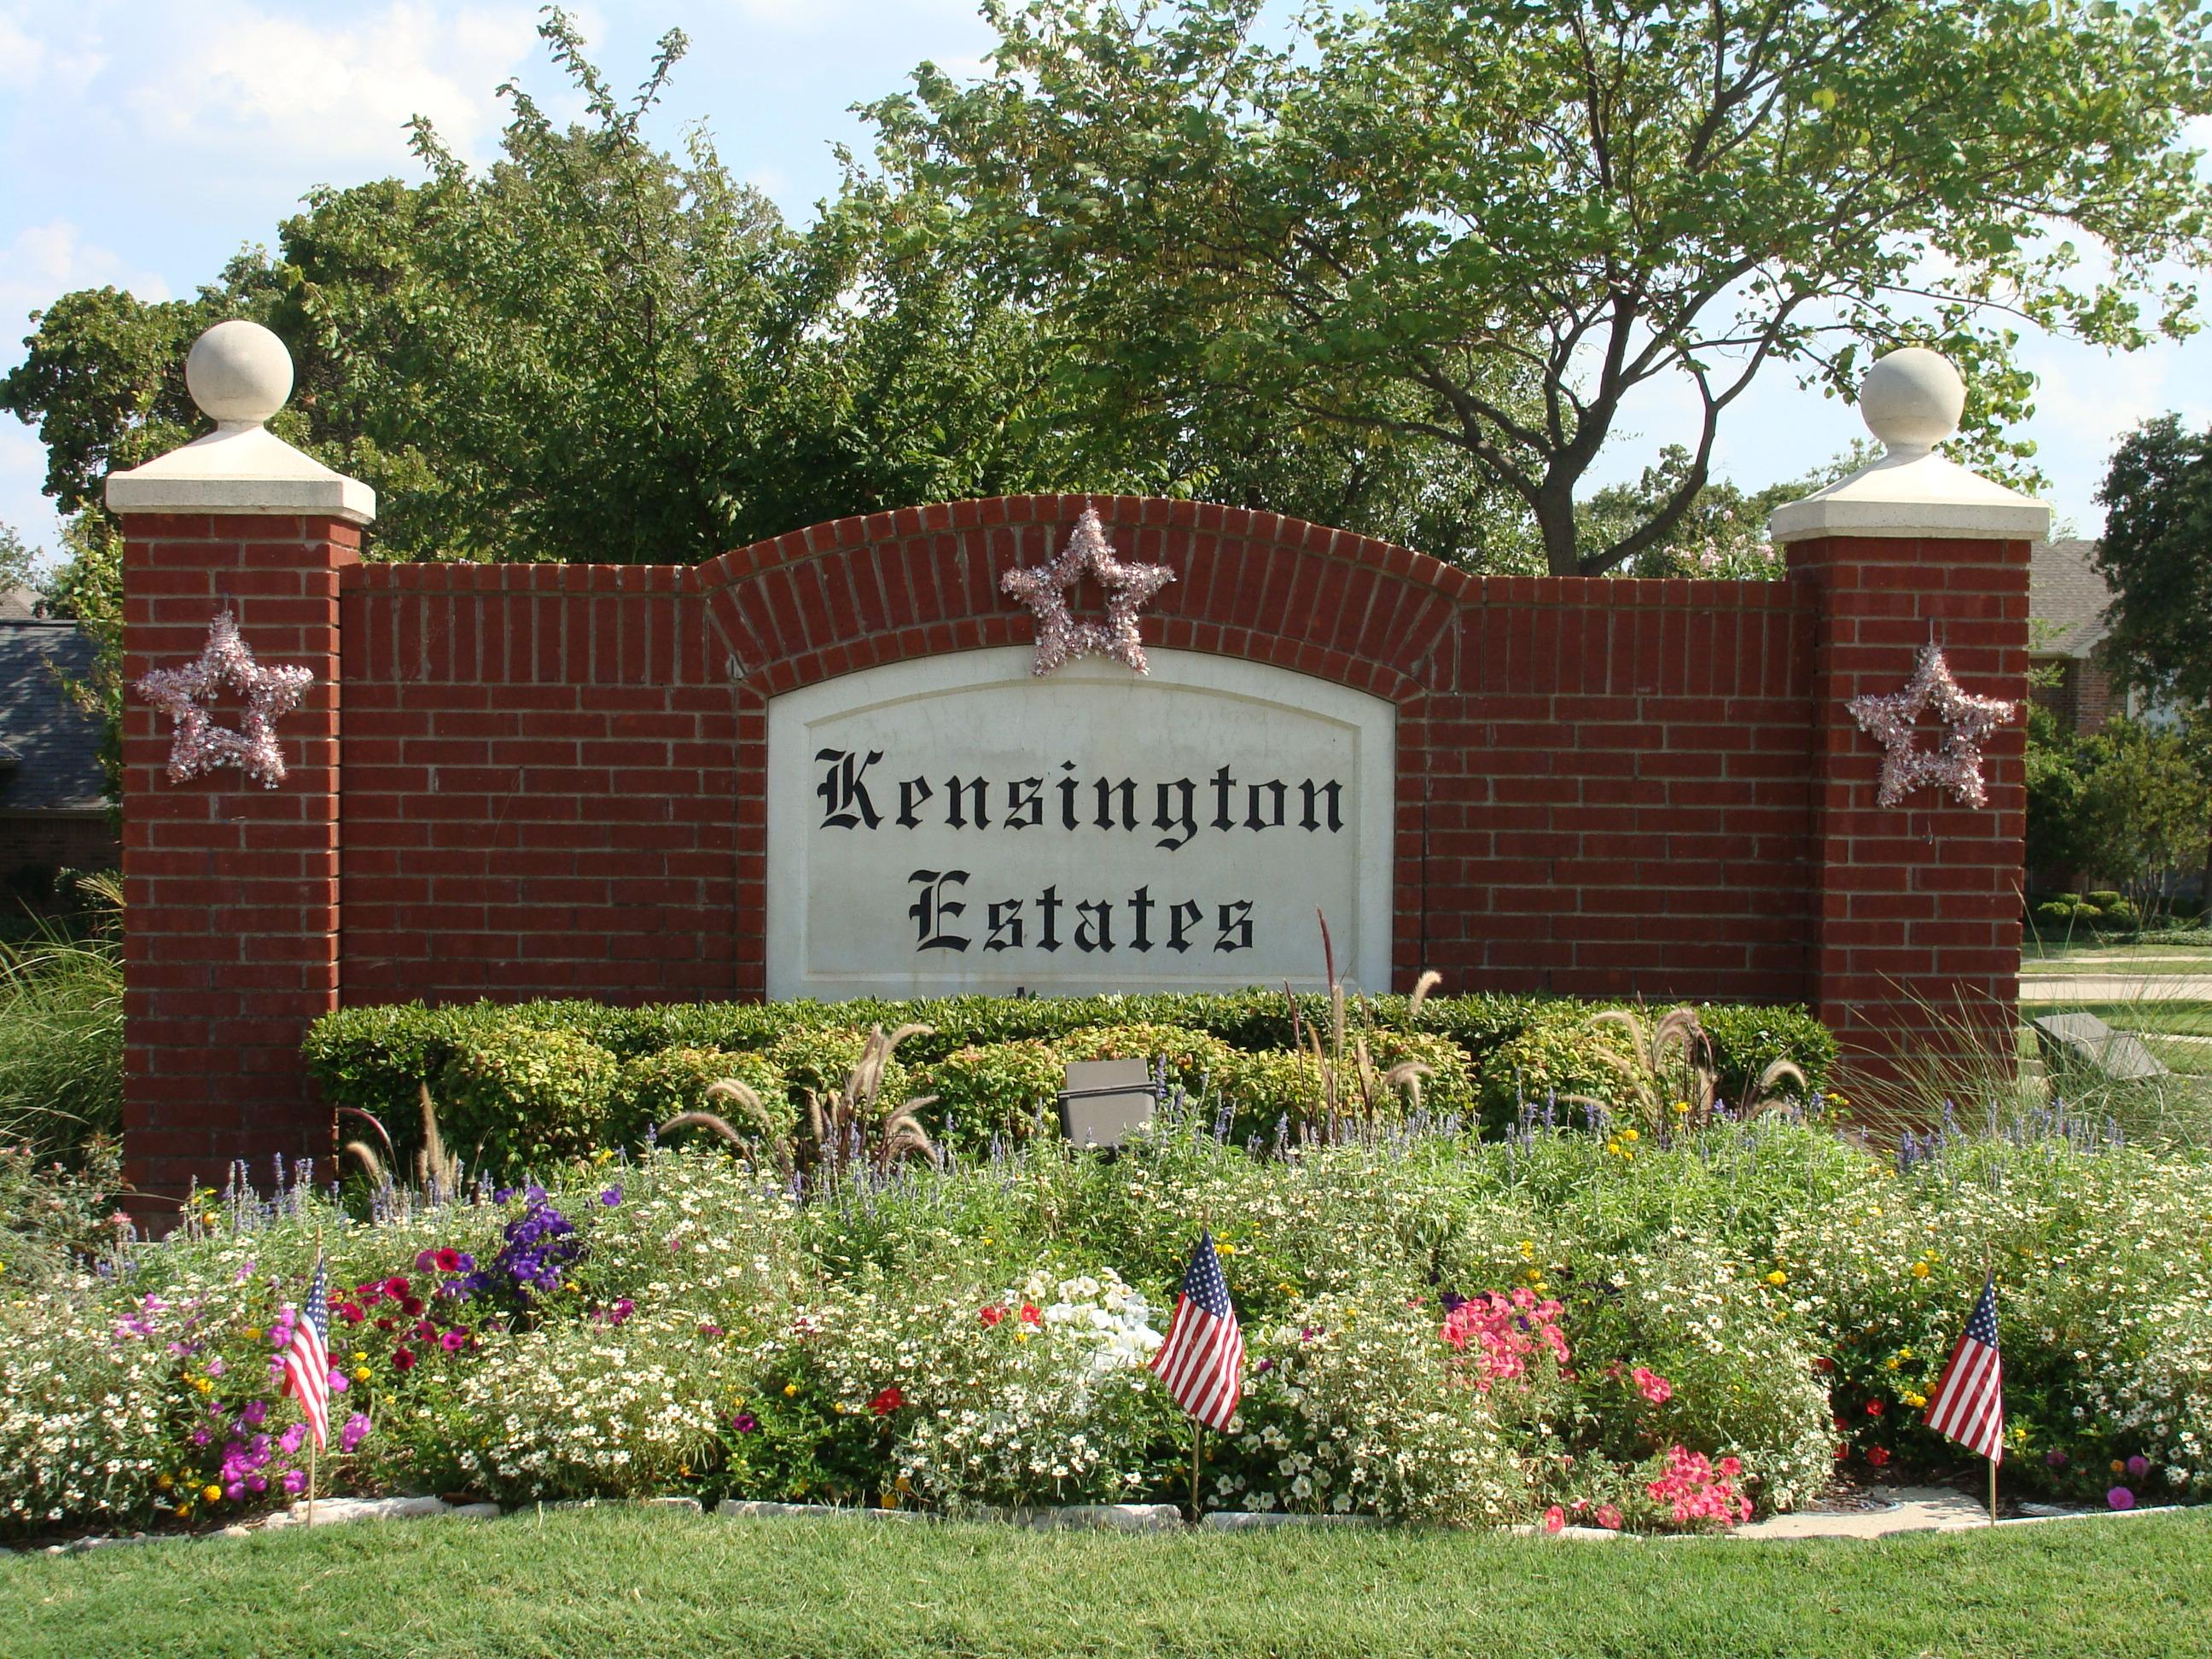 Kensington Estates Corinth TX Homes for Sale